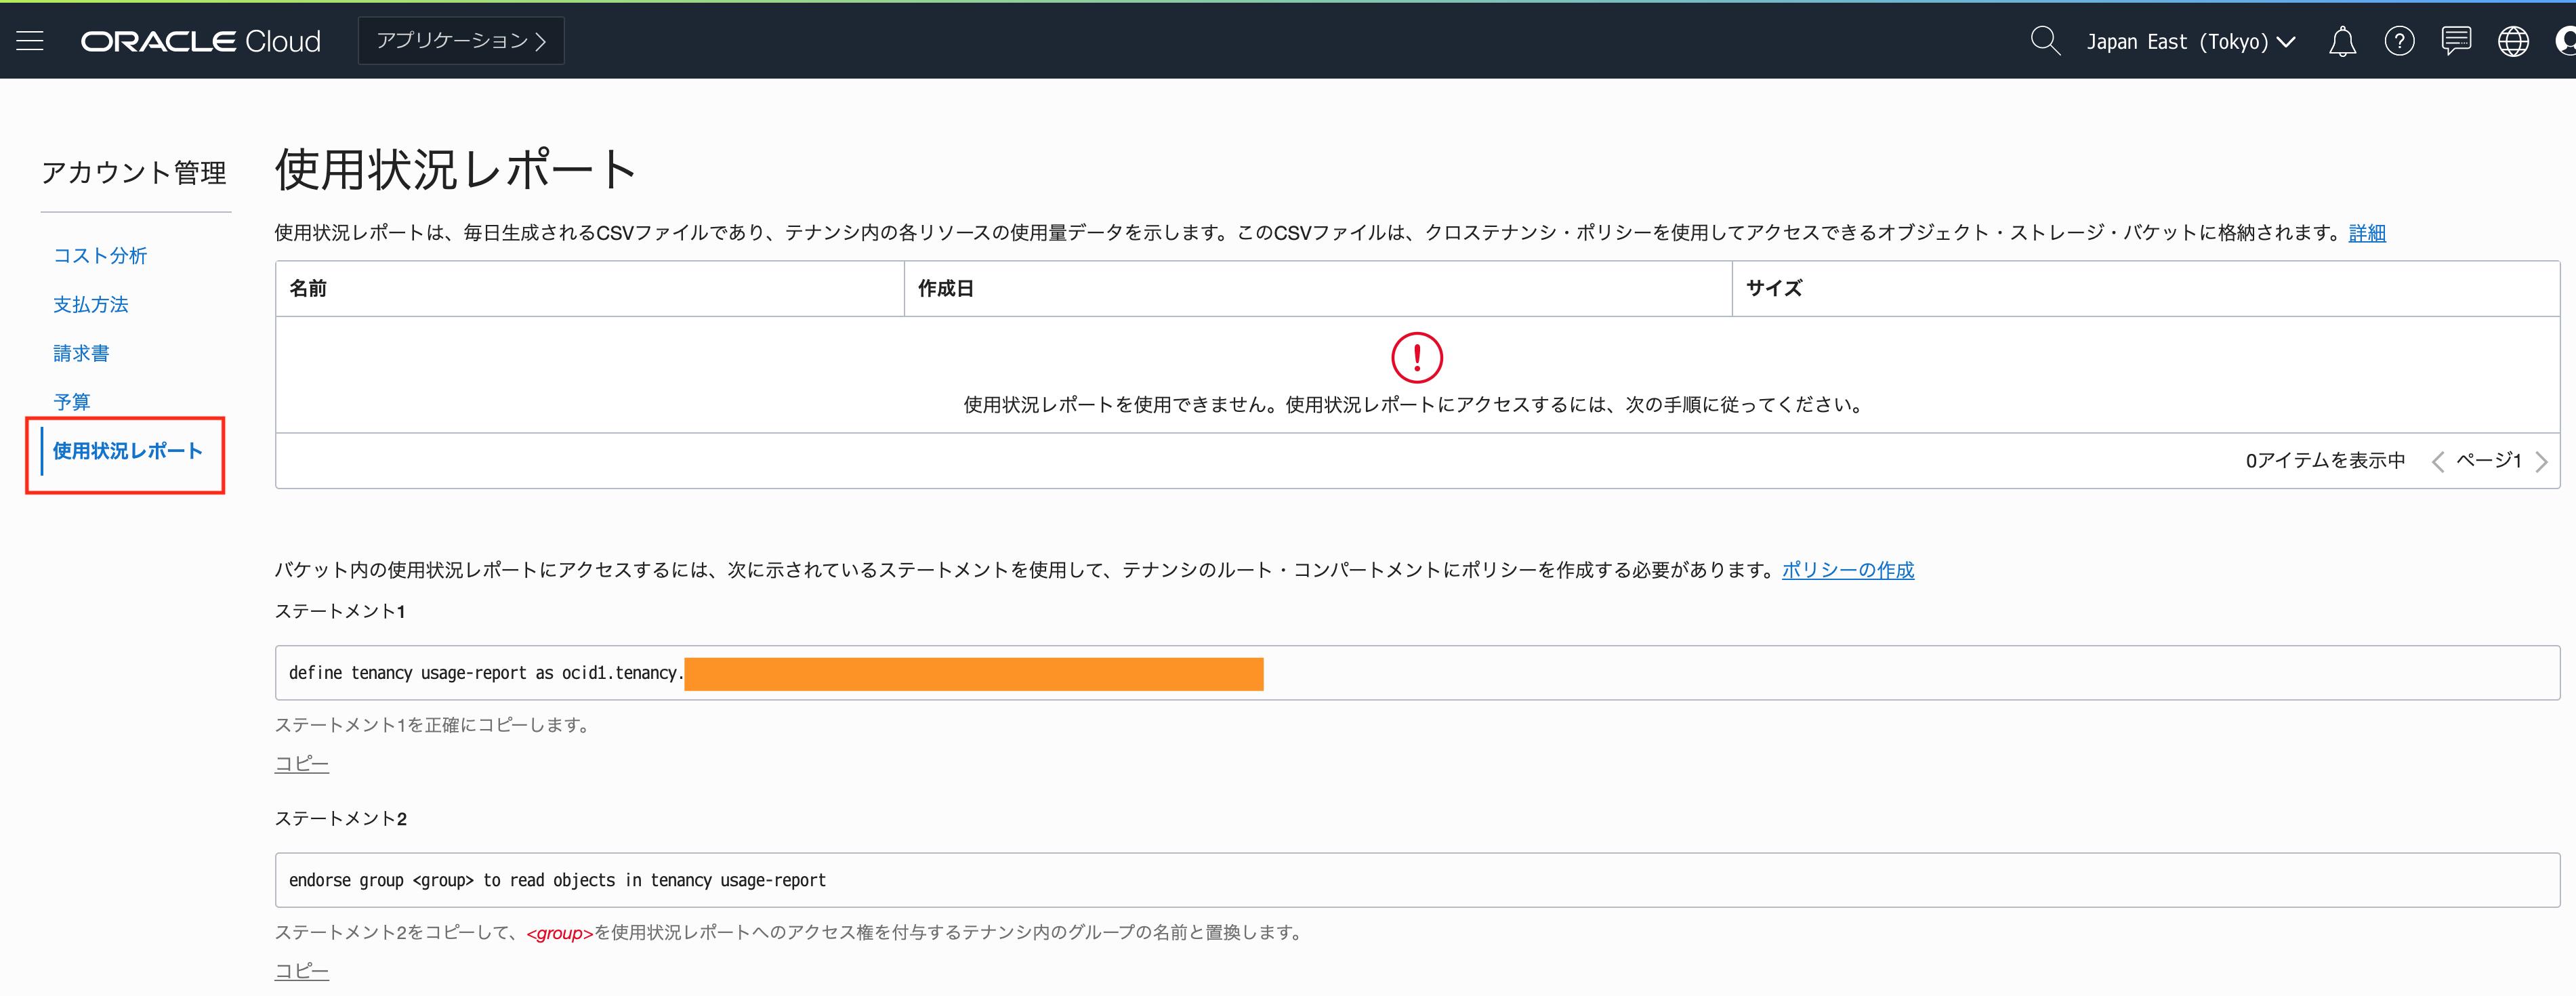 「使用状況レポート」画面